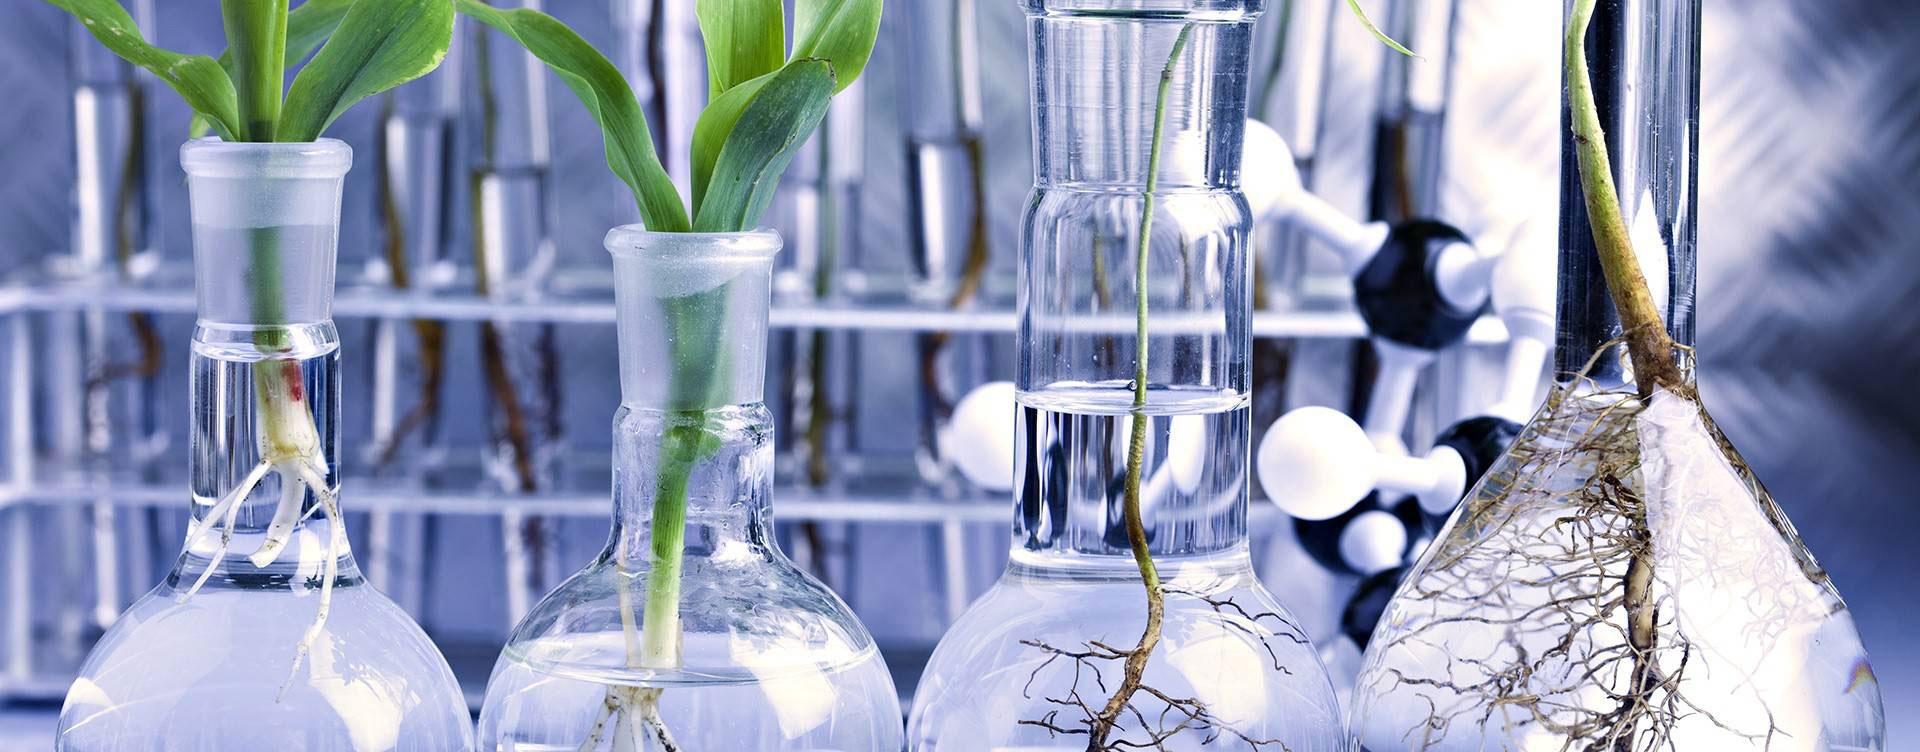 plants-lab-1920x1080-wallpaper-2148832